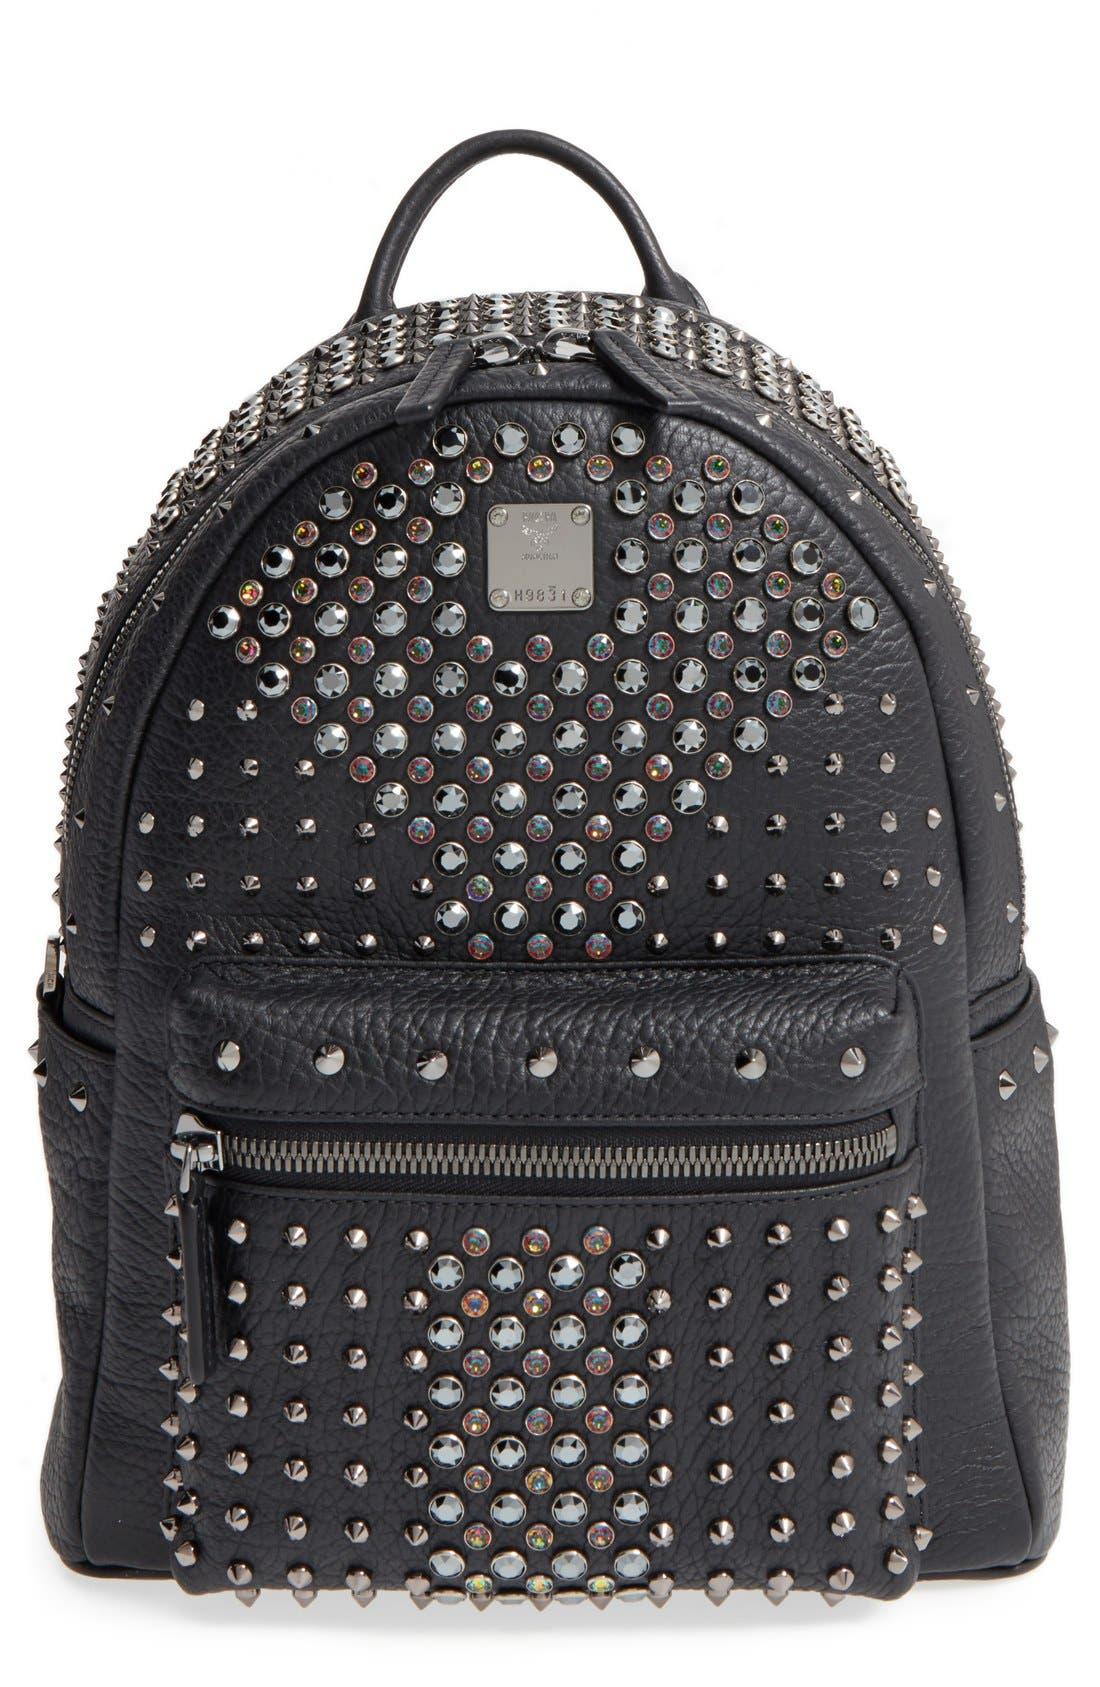 Main Image - MCM 'Small Stark Special' Swarovski Crystal Embellished Leather Backpack